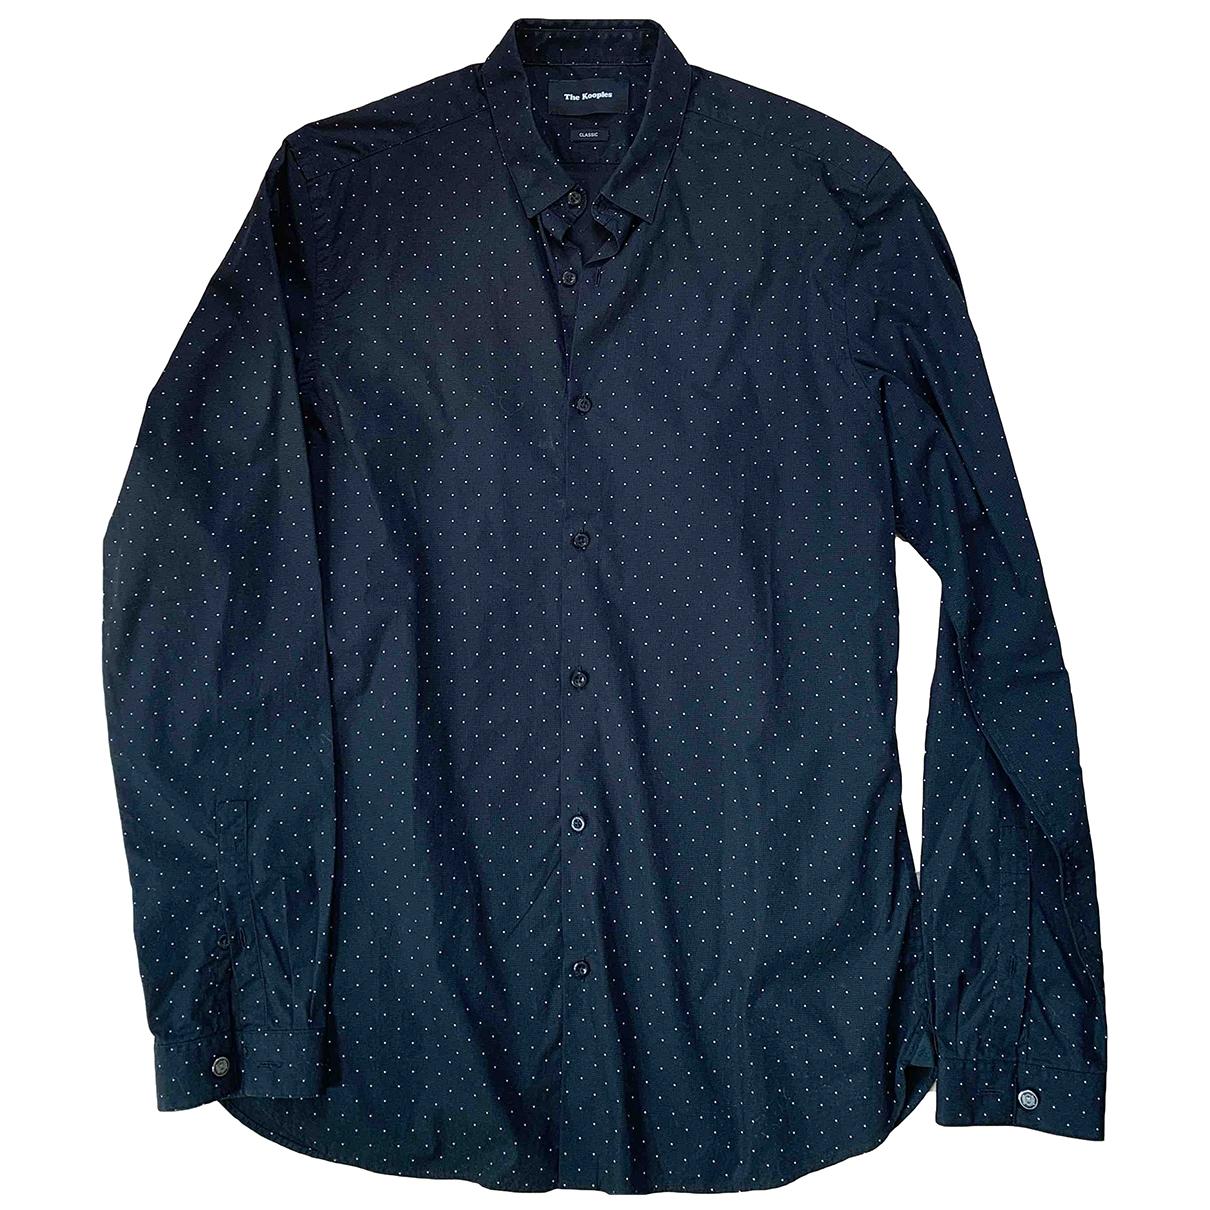 Camisas Spring Summer 2019 The Kooples